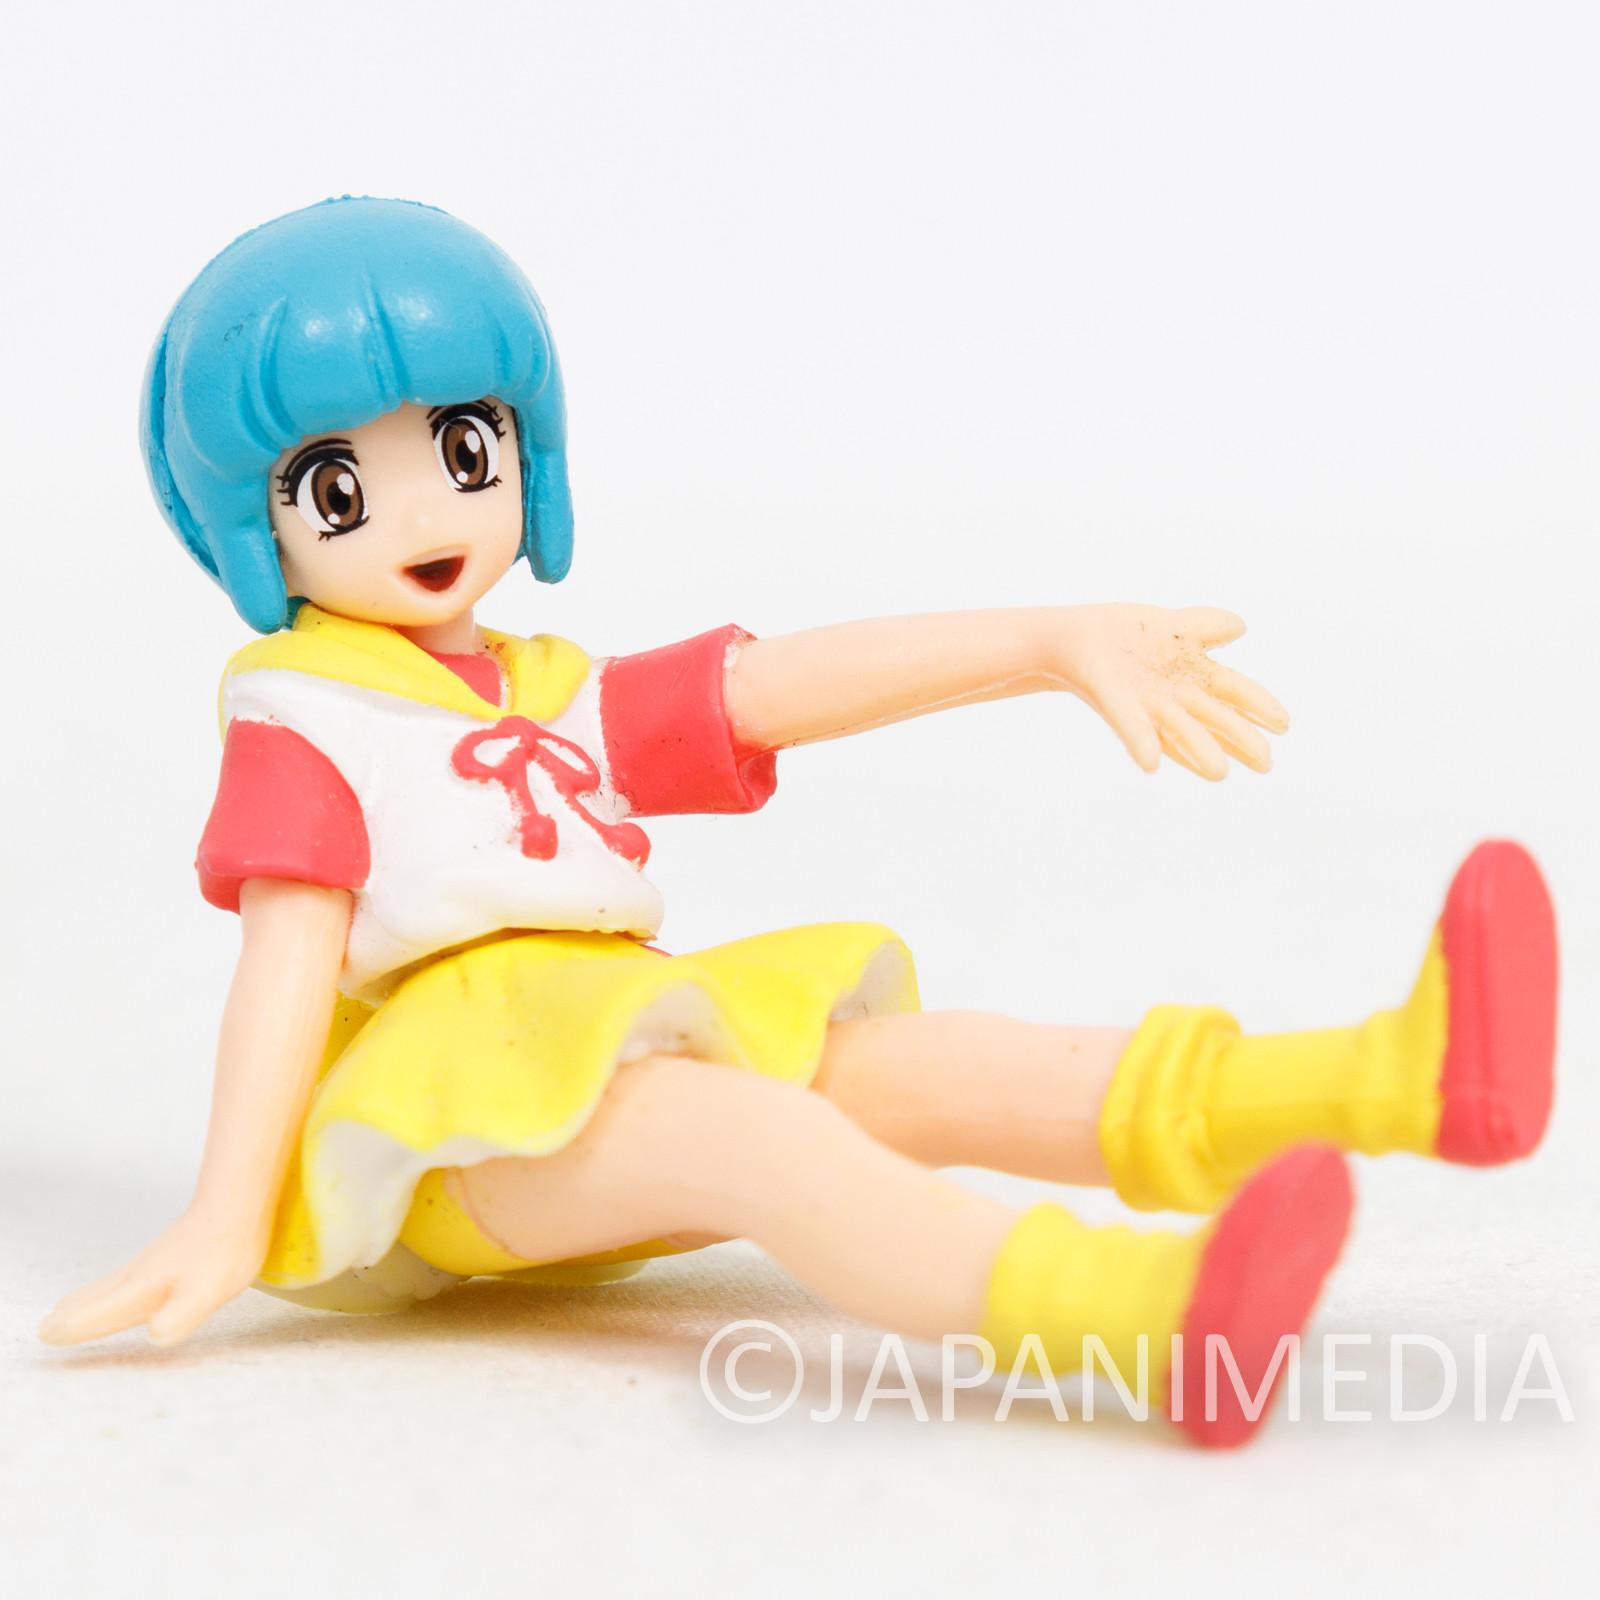 Magic Angel Creamy Mami Yu Morisawa Desktop Miniature Figure